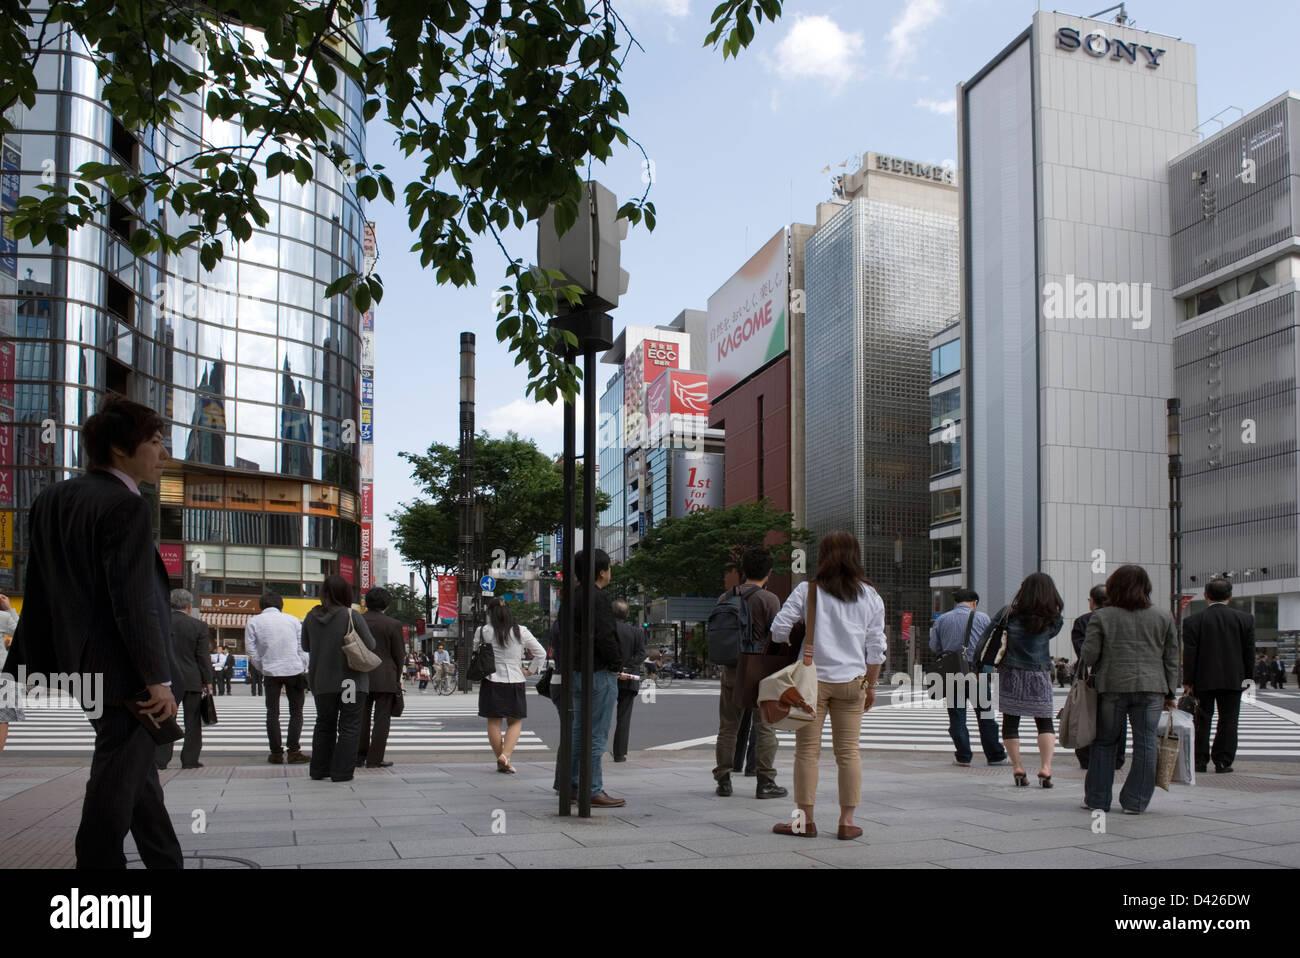 Pedestrians on the corner of Harumi-dori and Sotobori-dori streets in the upscale shopping district of Ginza, Tokyo. - Stock Image